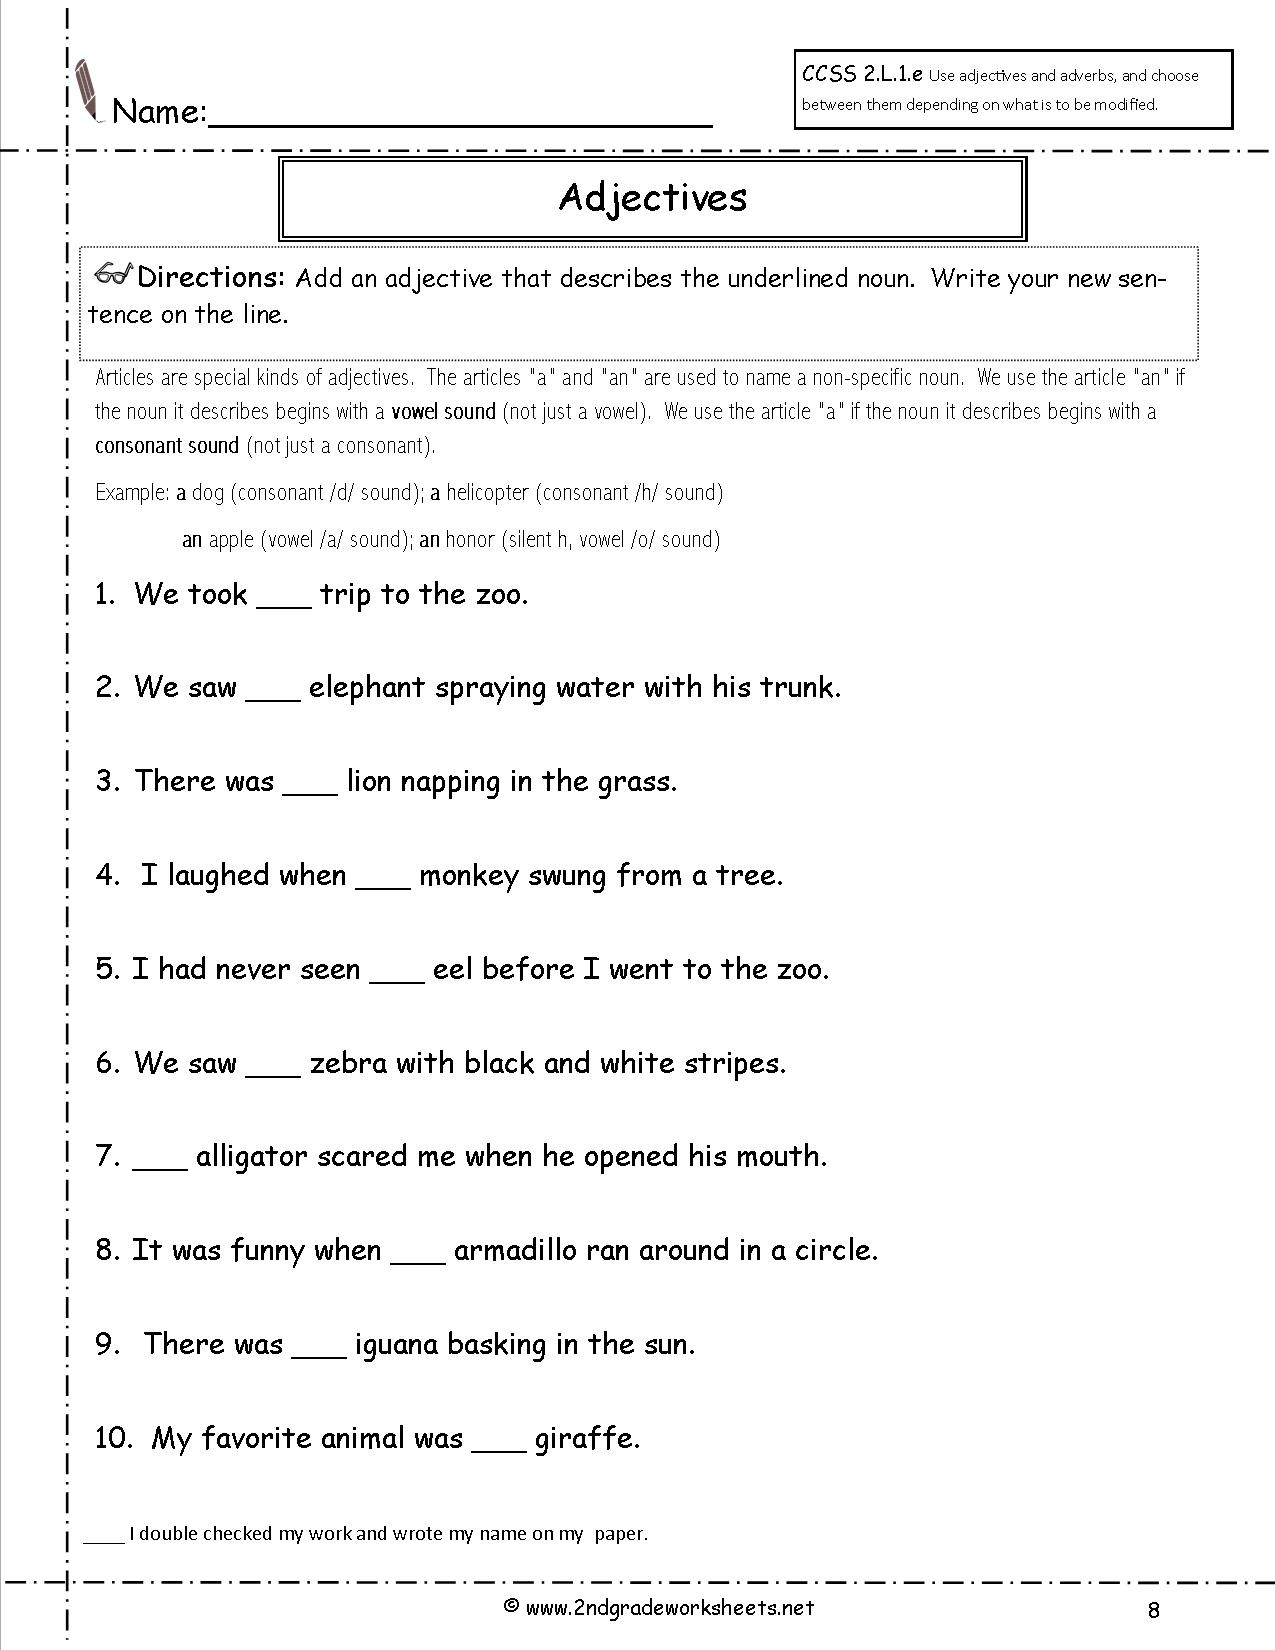 Free Language/grammar Worksheets And Printouts | English Worksheets Printables